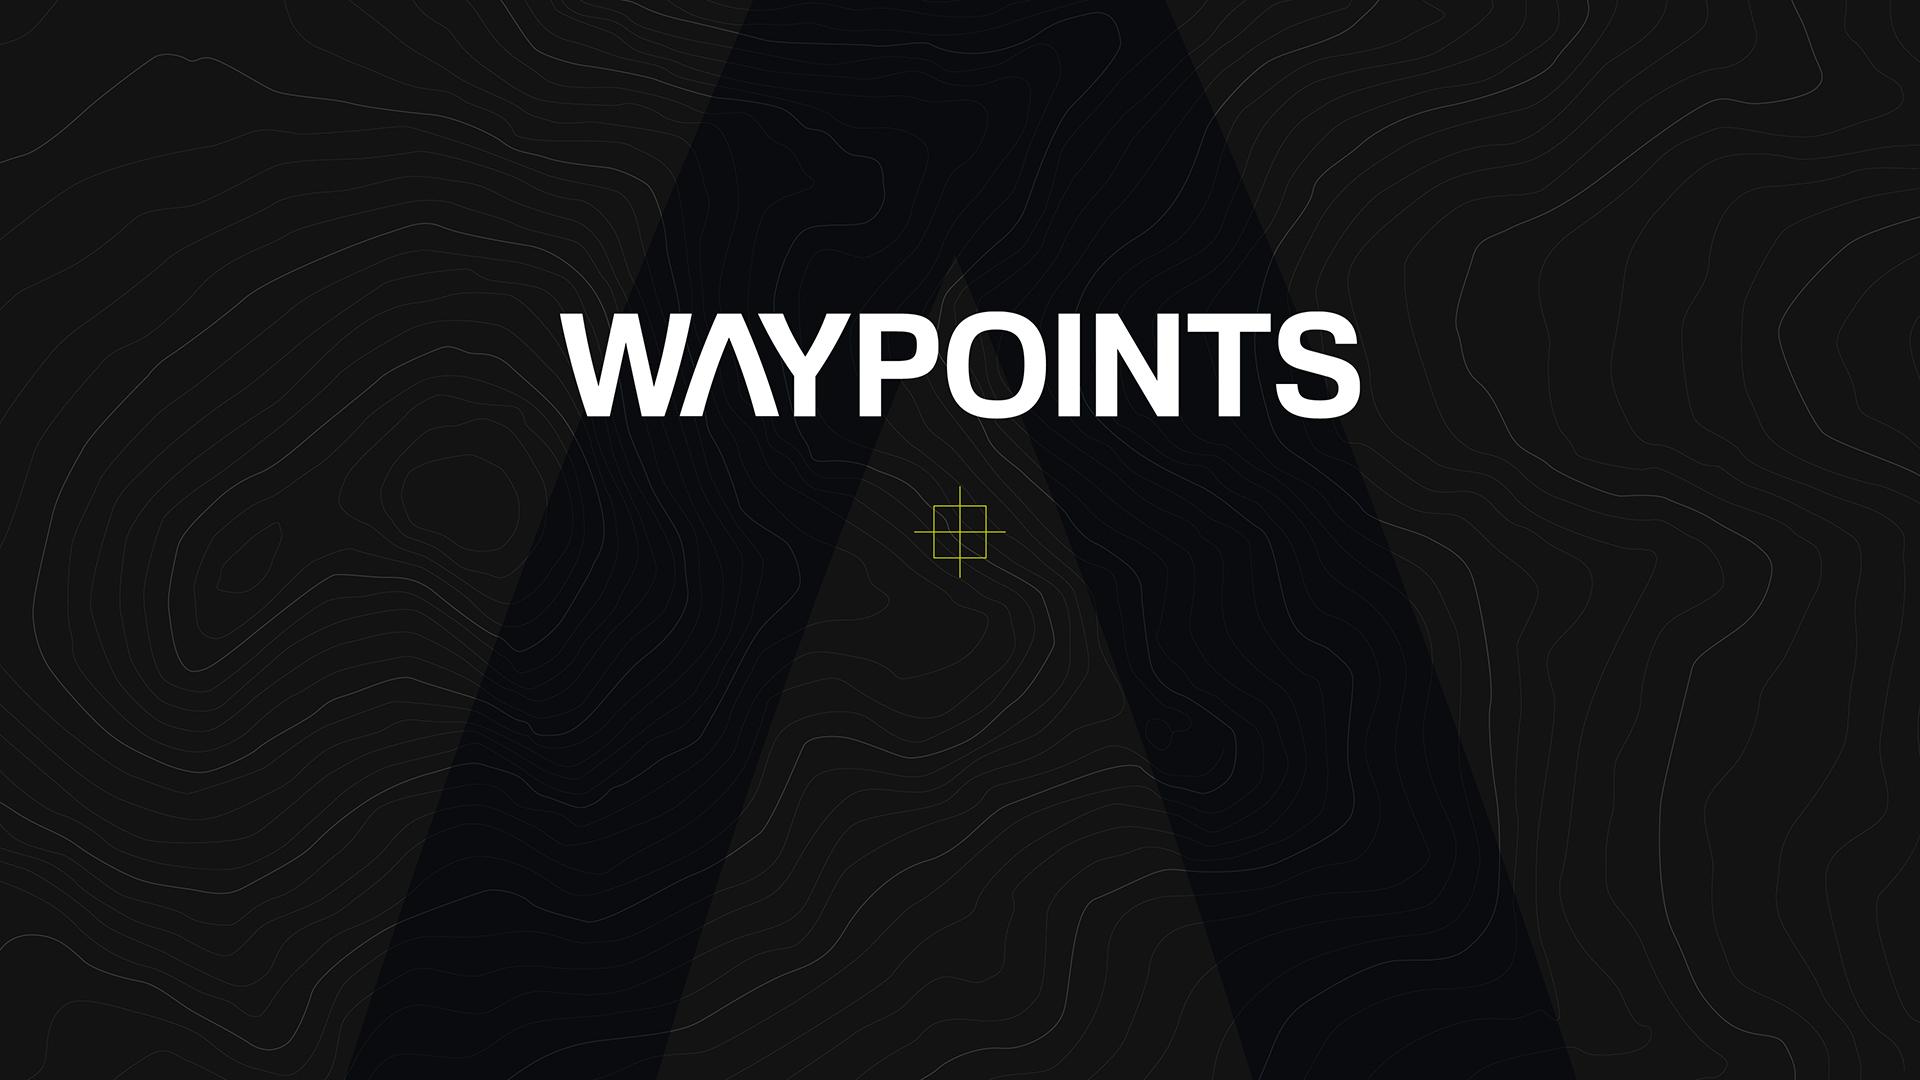 WAYPOINTS_1_Web_BG_1920x1080_LOGO2_3